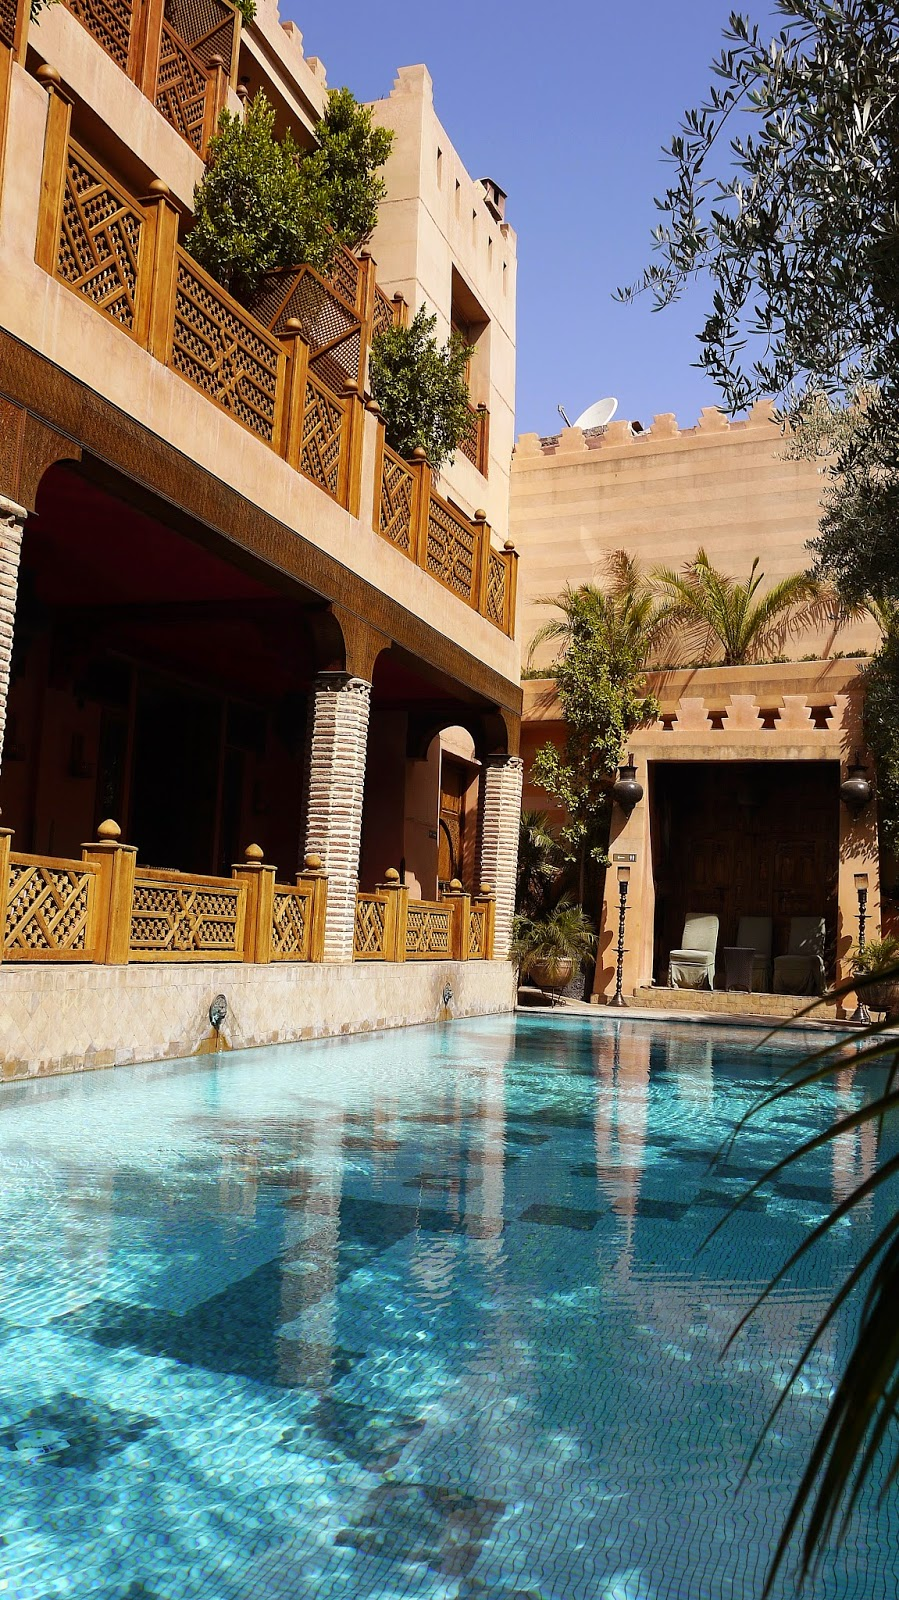 La Maison Arabe: A Luxurious, Historical Retreat in Marrakech